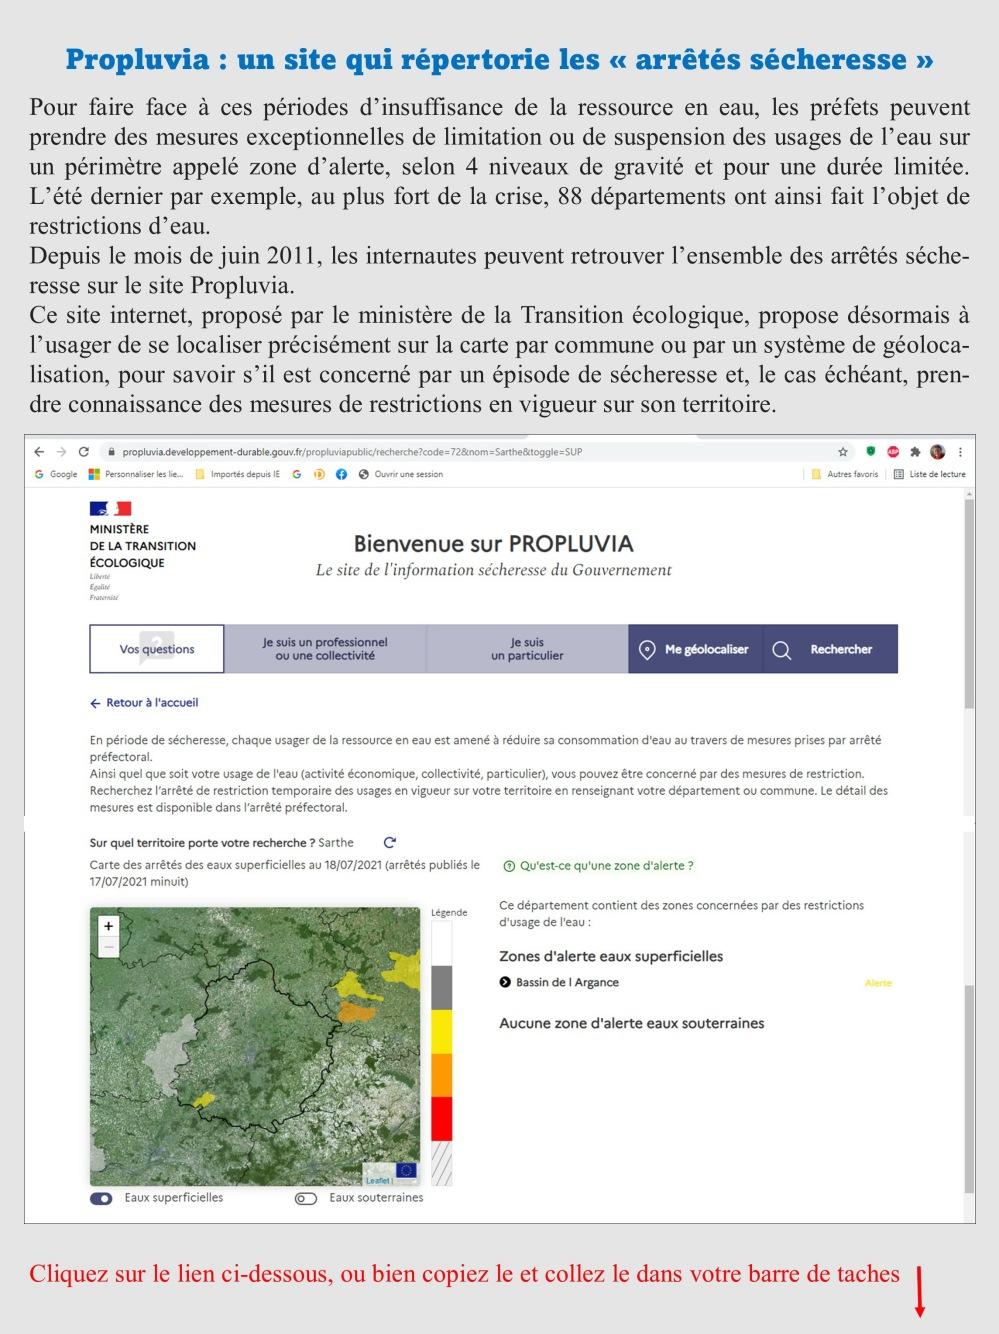 Propluvia site arrété sécheresse